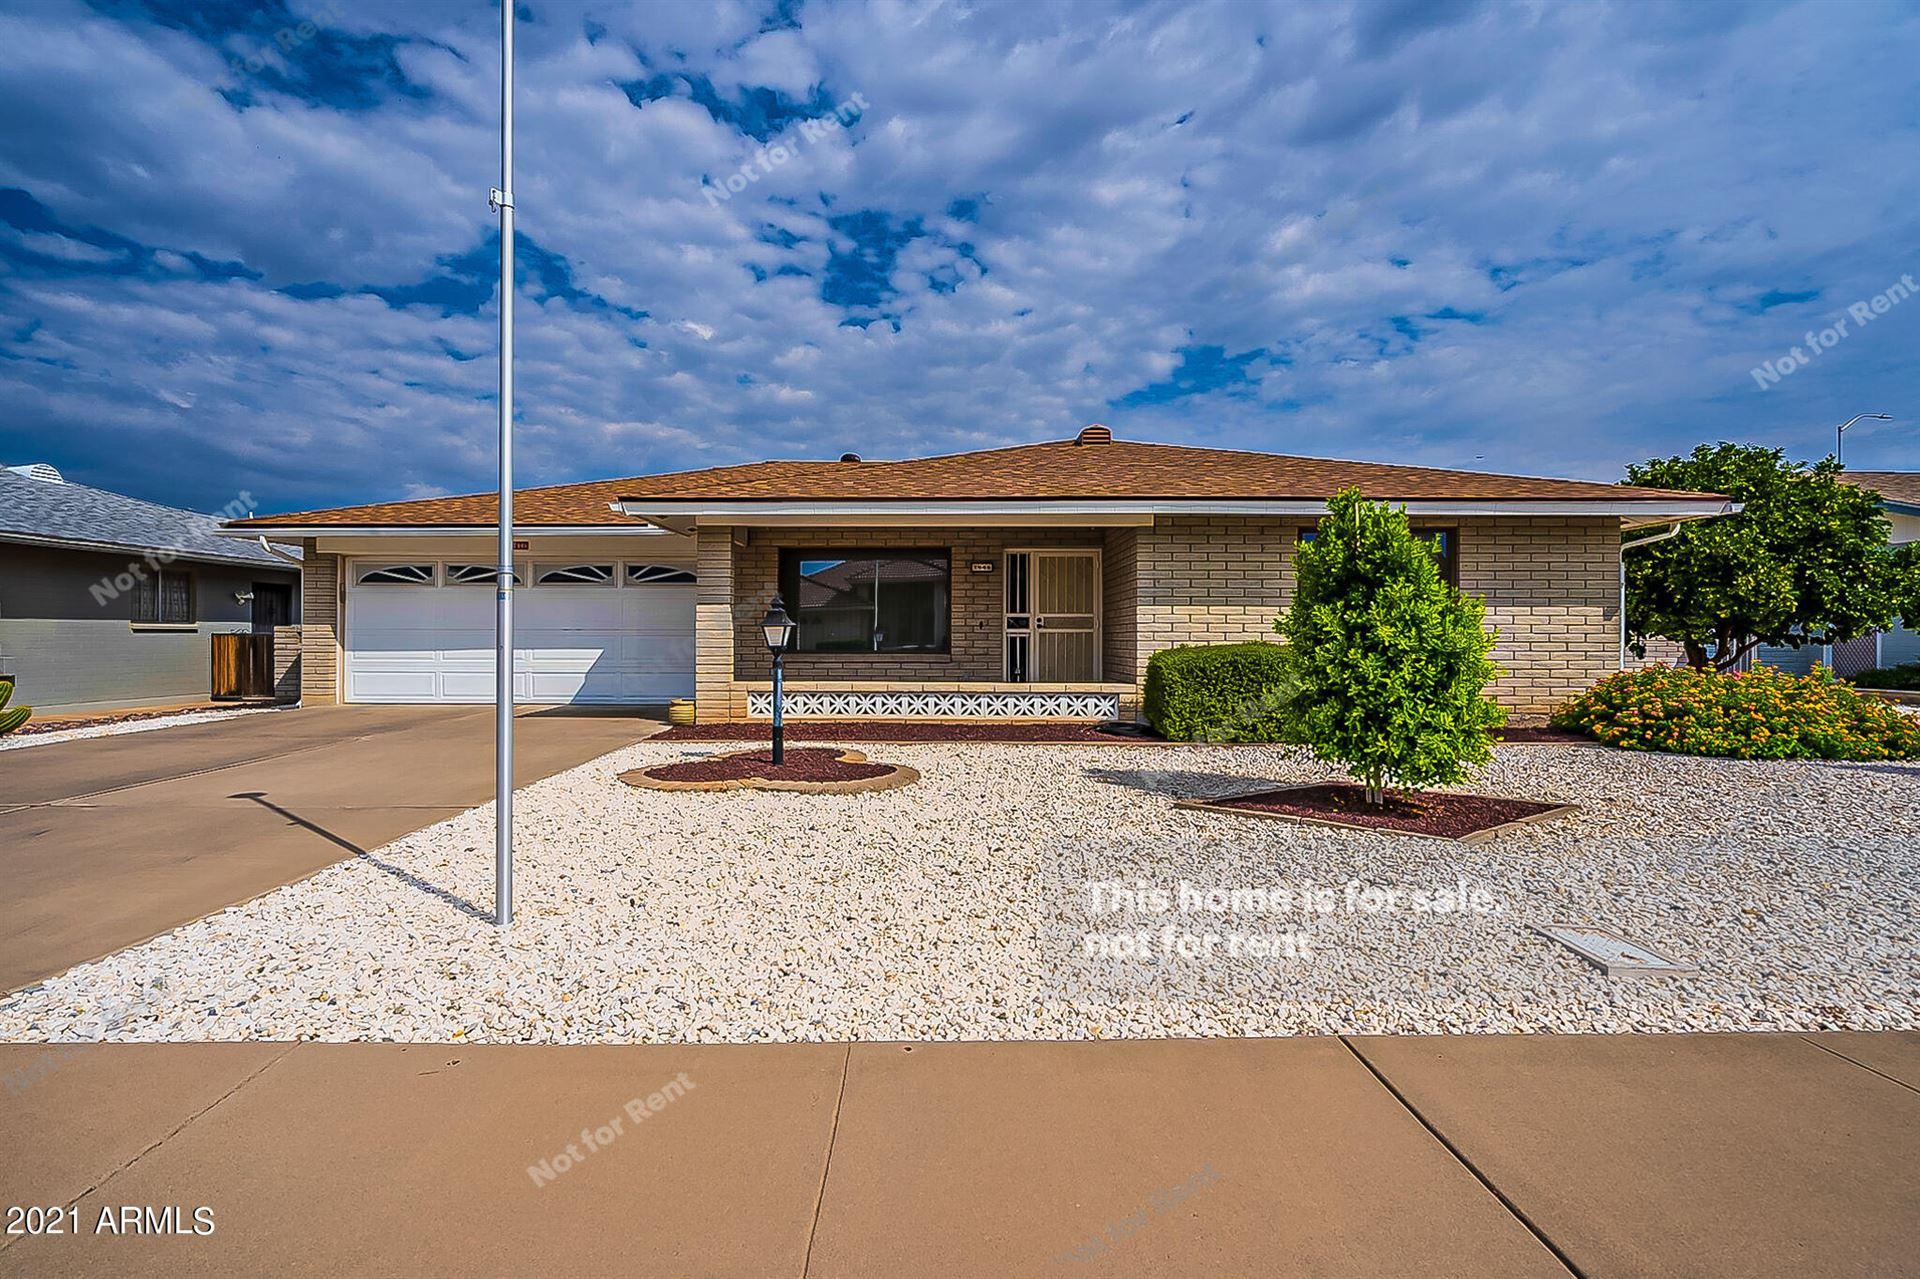 7946 E MESETO Avenue, Mesa, AZ 85209 - #: 6302860